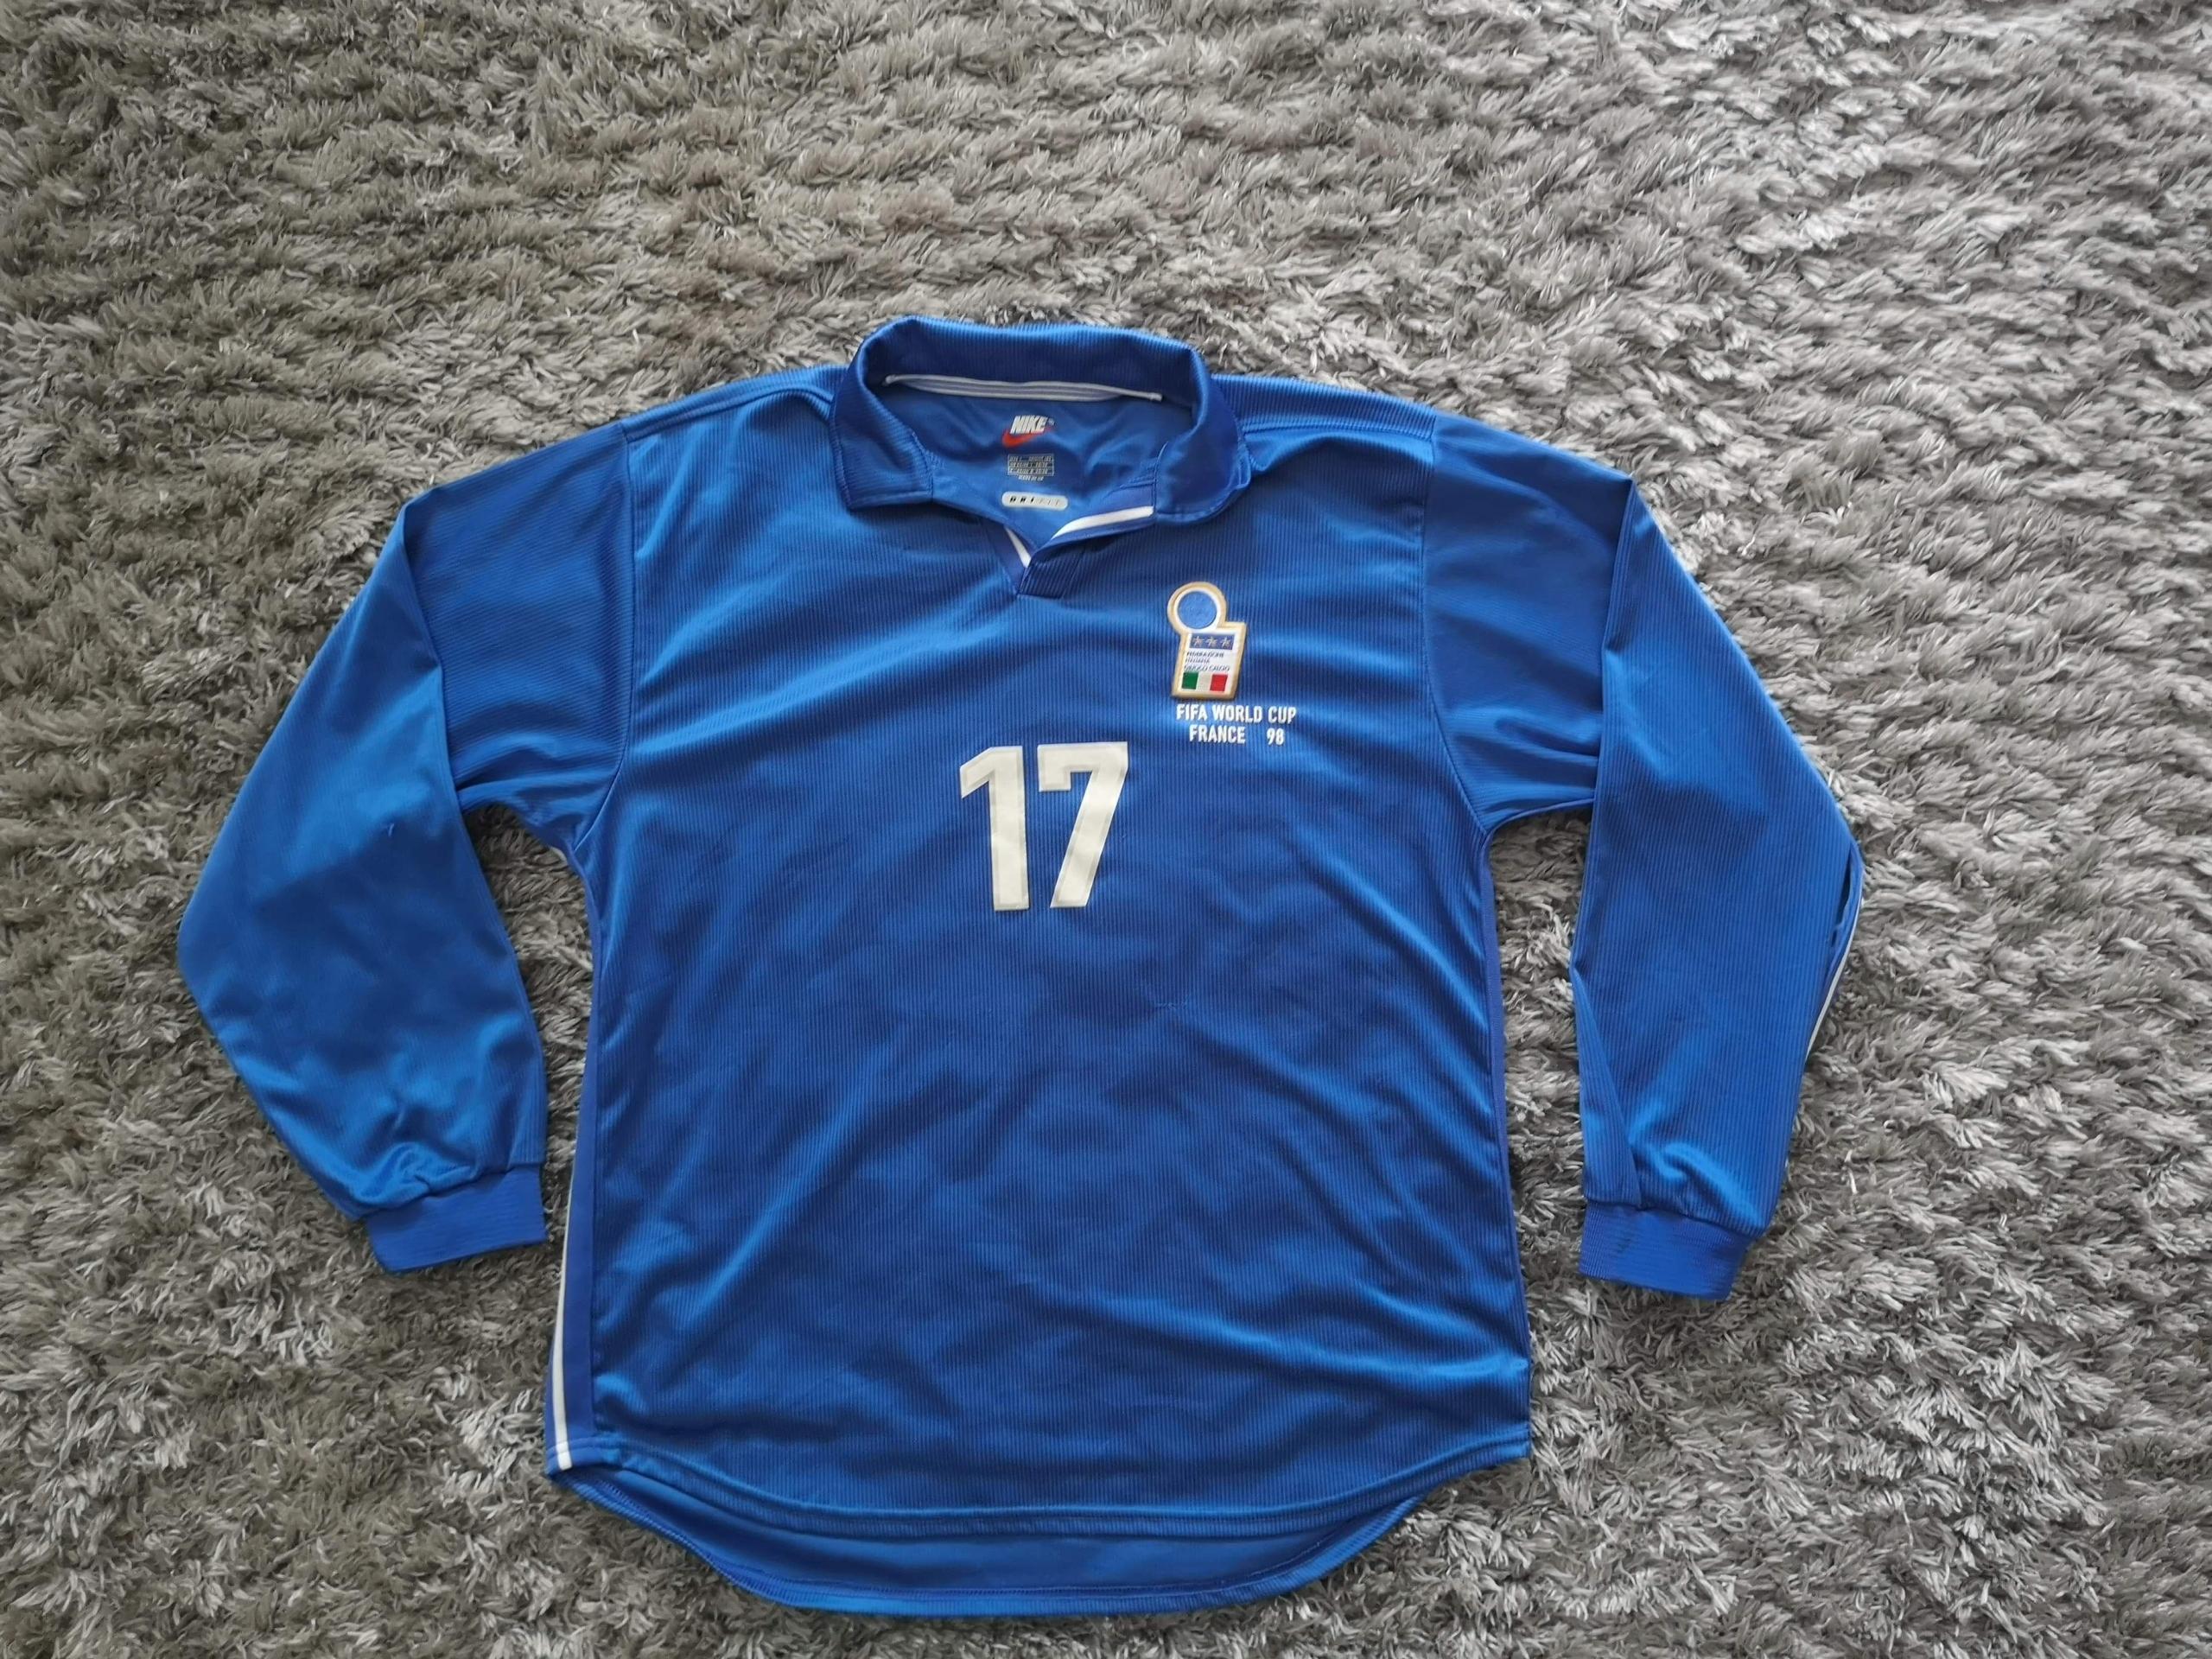 Nike ITALIA WORLD CUP FRANCE 98 MORIERO 17 MECZOWA